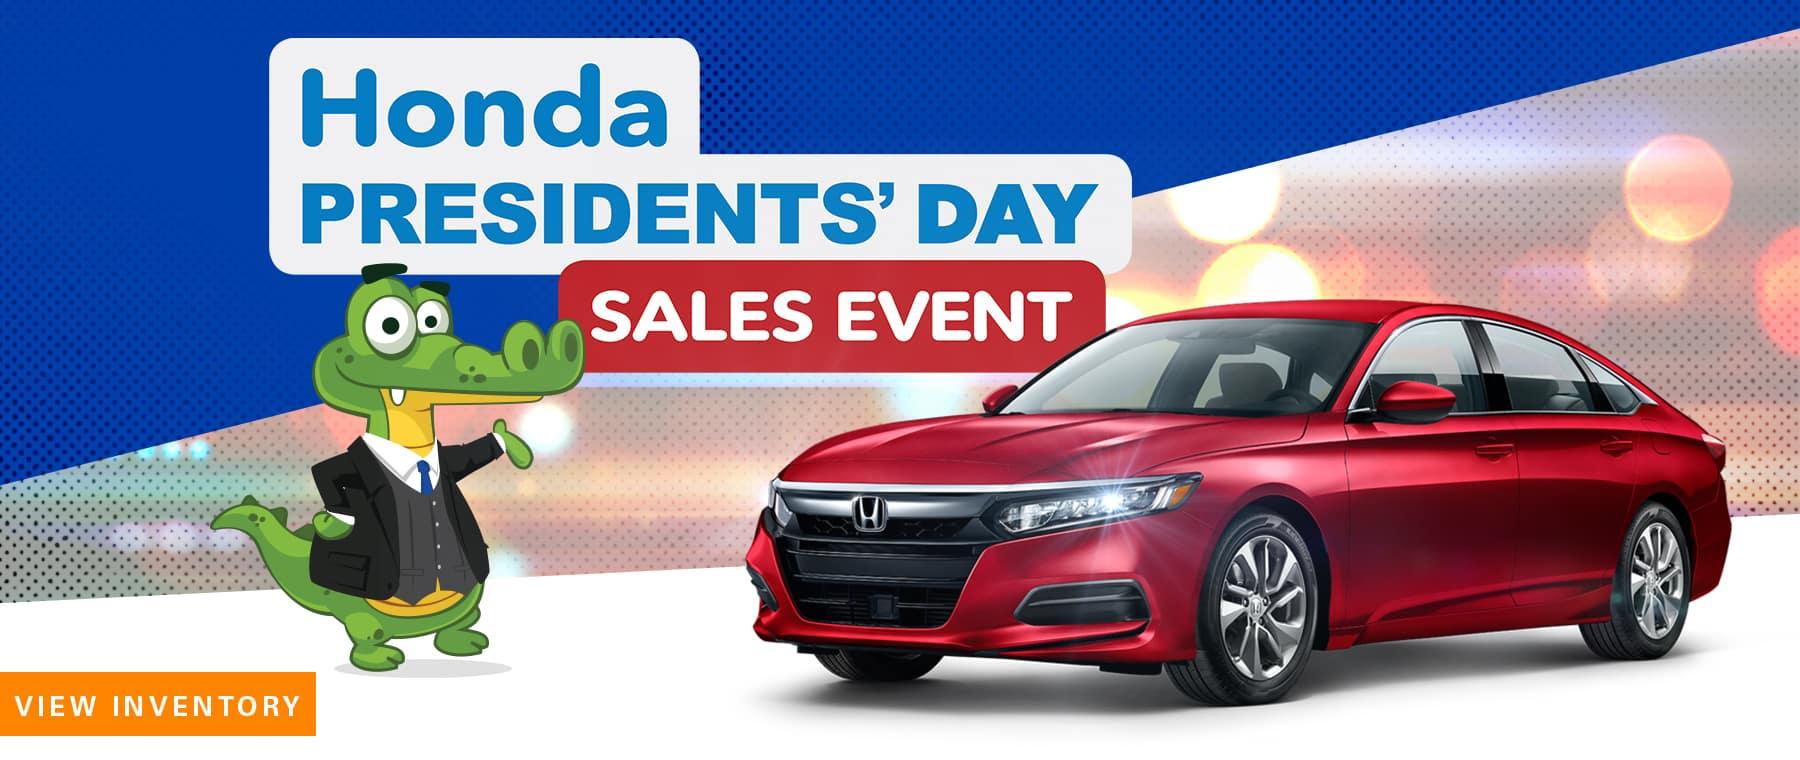 Honda President's Day Sales Event